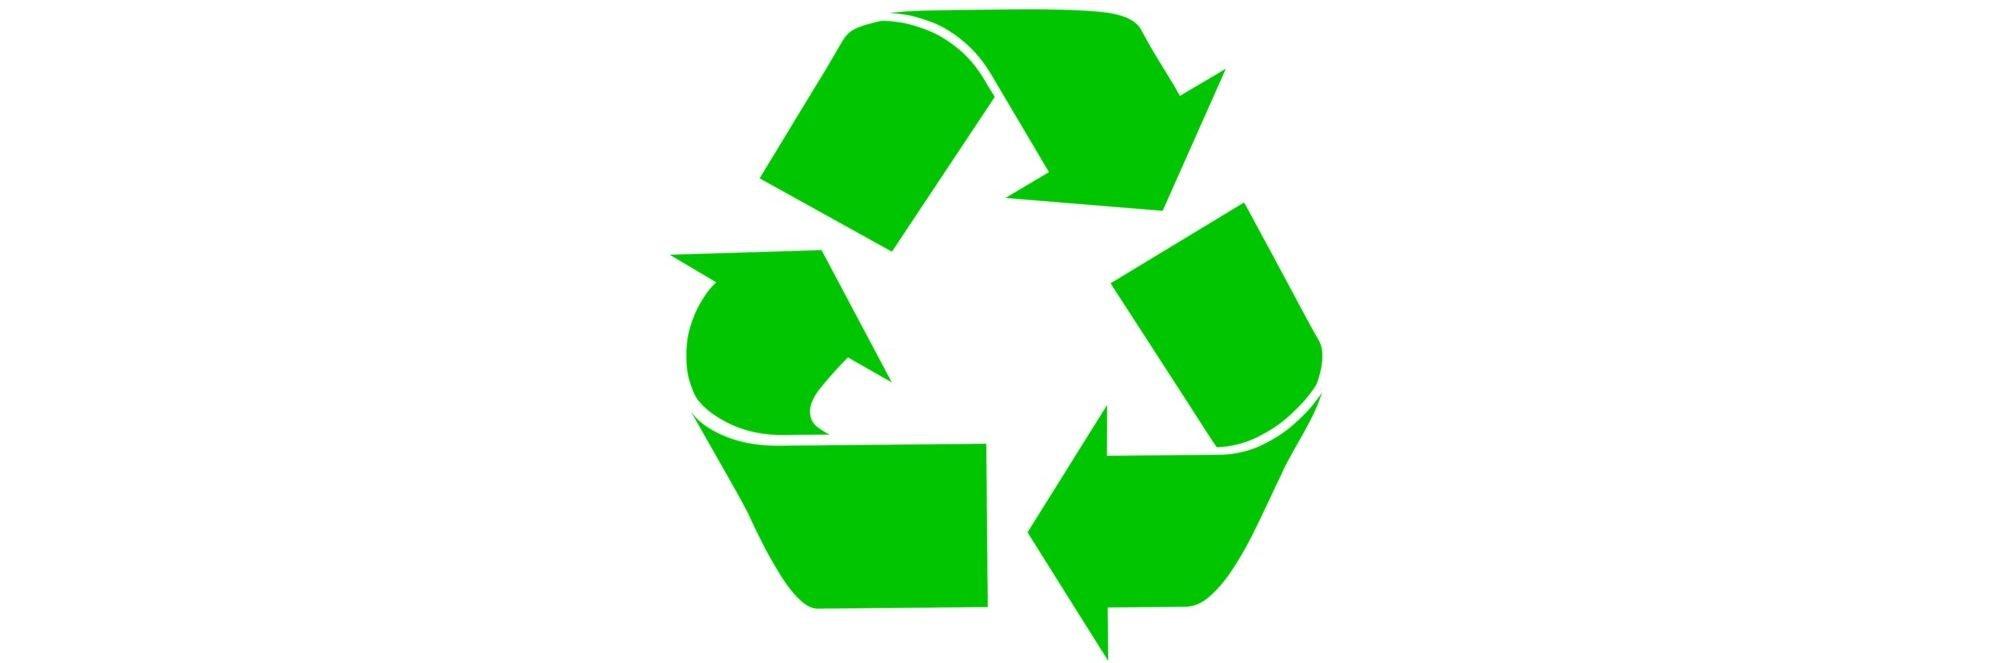 Avviso eventuali variazioni raccolta rifiuti